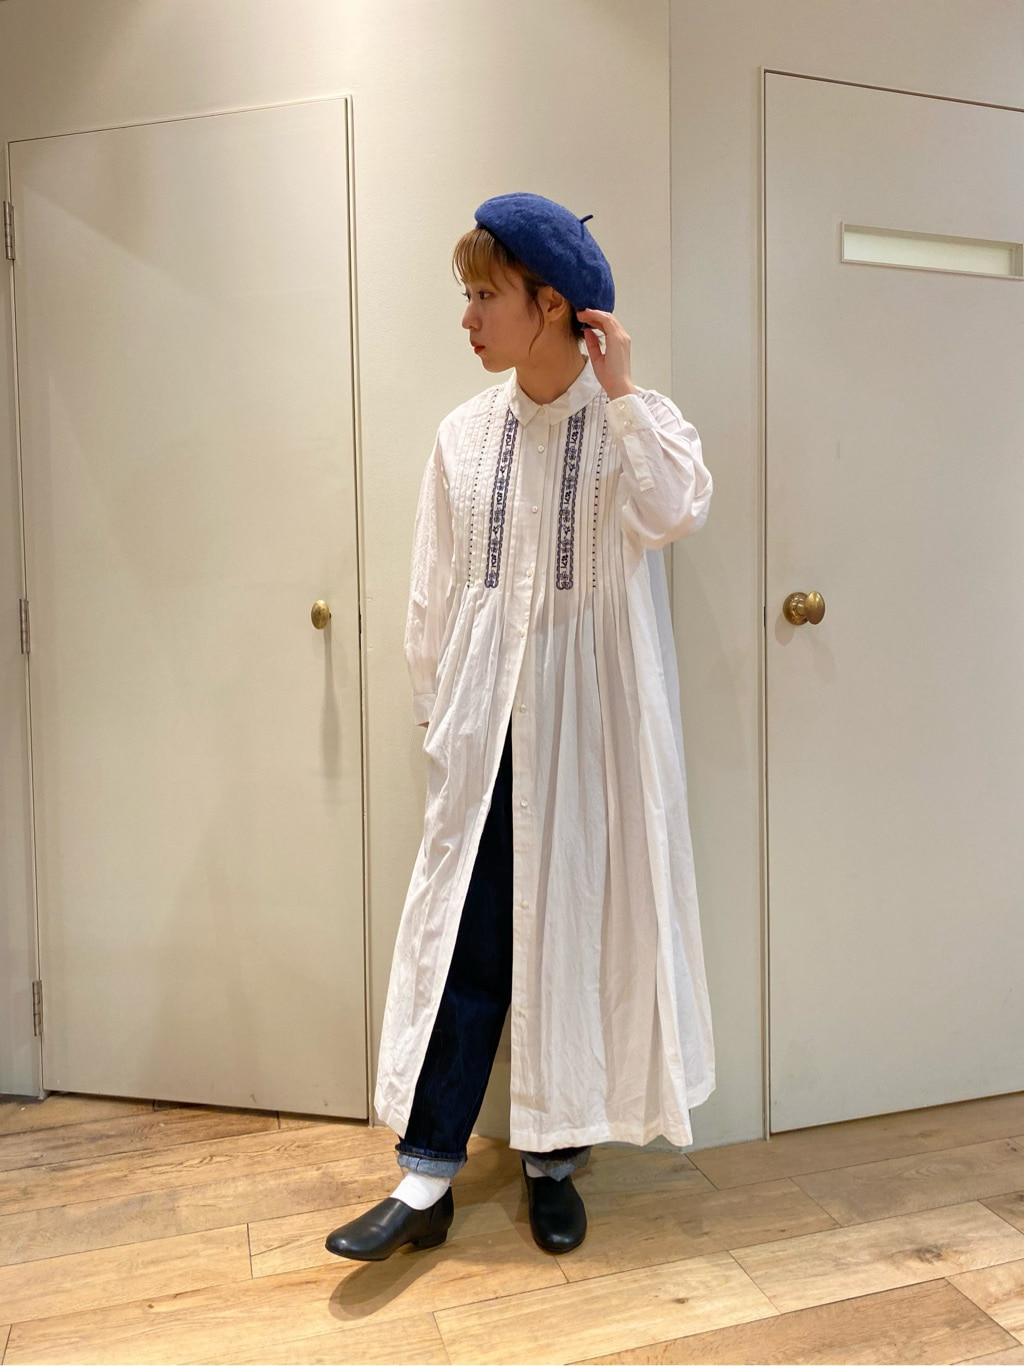 bulle de savon 新宿ミロード 身長:157cm 2020.11.25